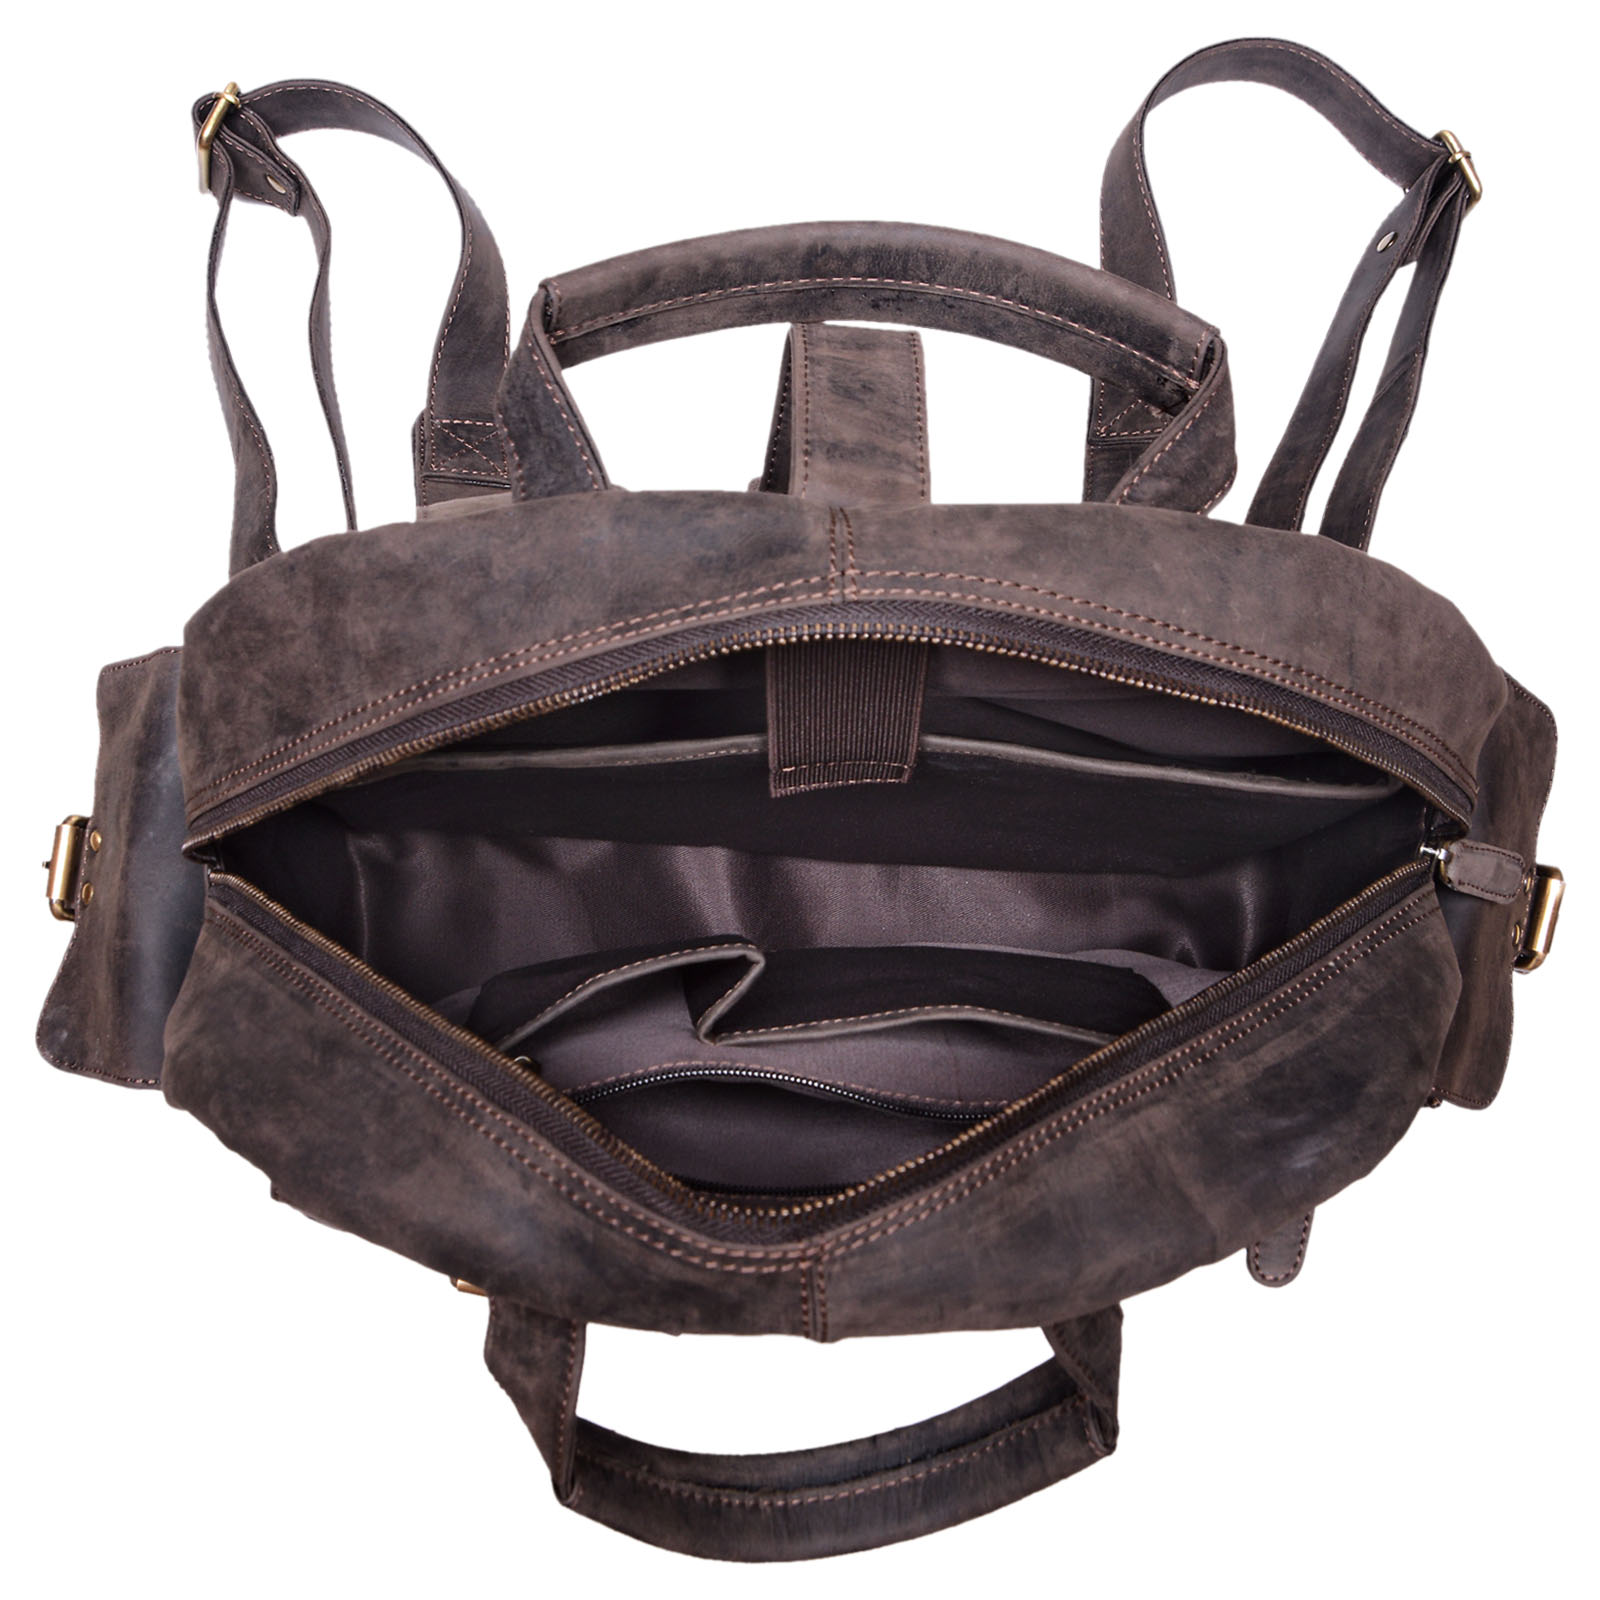 "STILORD ""Nevada"" Rucksack Leder groß im Vintage Design mit 13,3 Zoll Laptopfach Unisex Lederrucksack Uni Schule Lehrer Echtleder  - Bild 10"